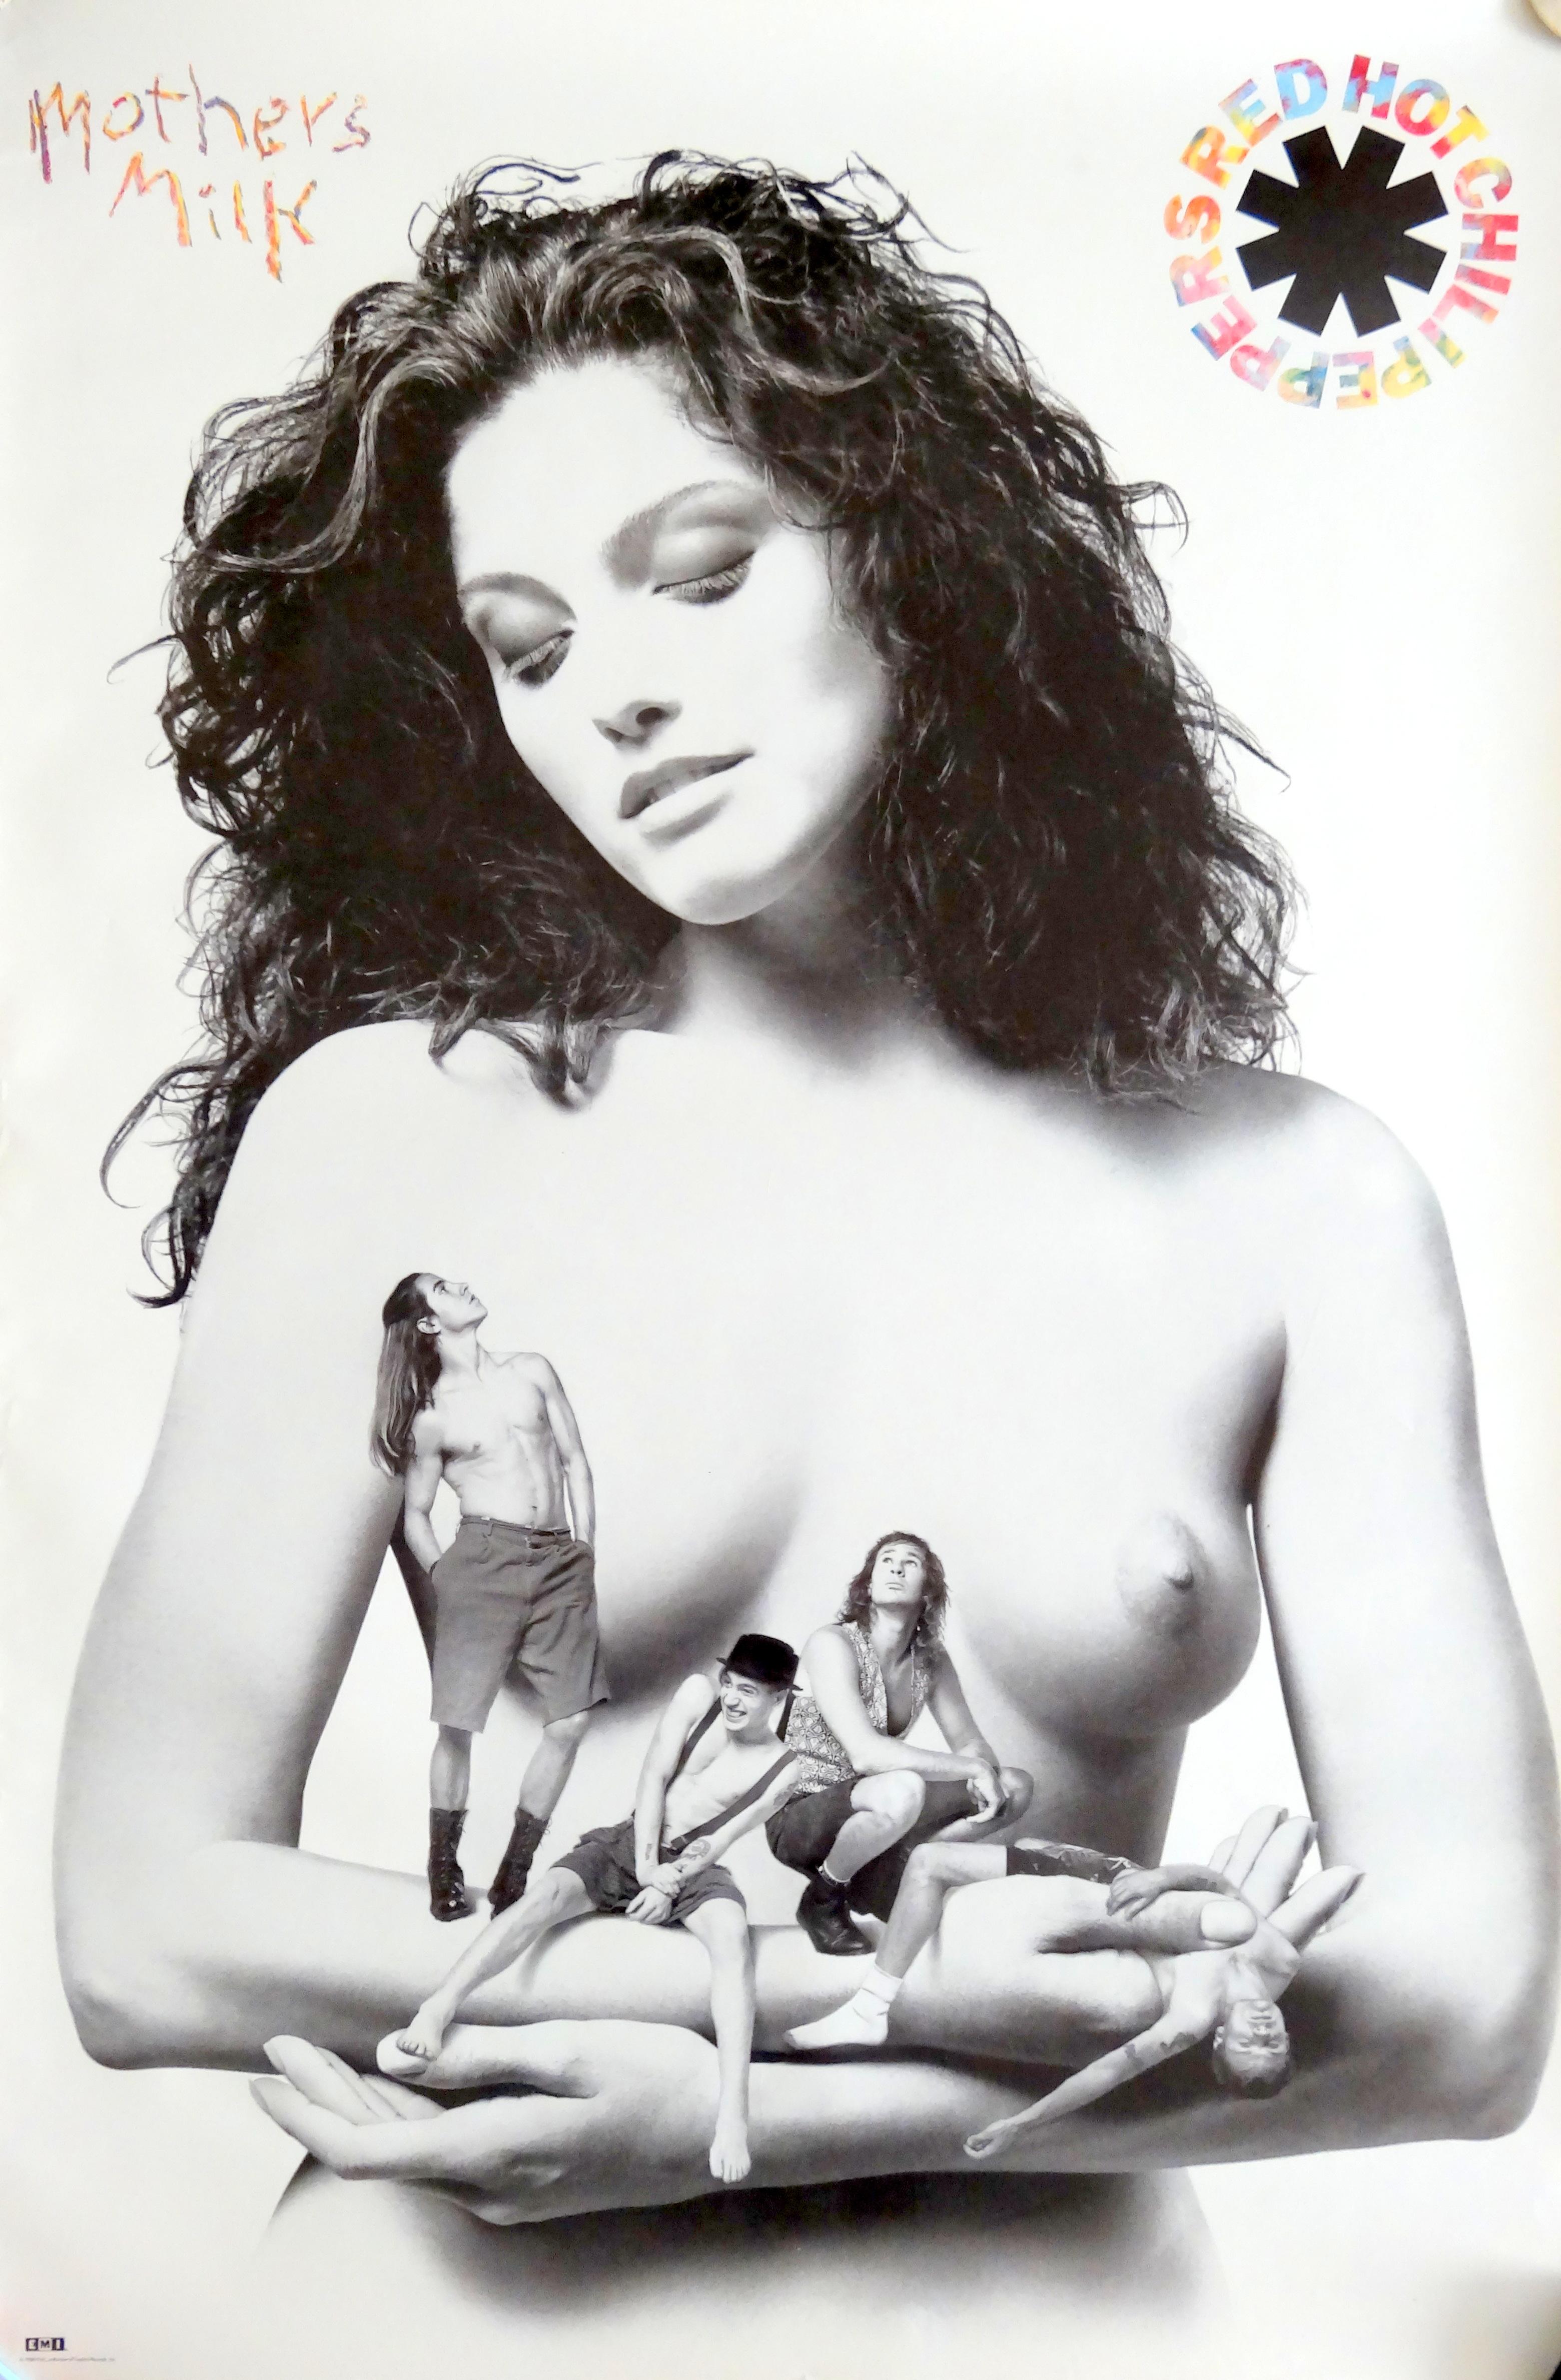 pics ofmy sister naked